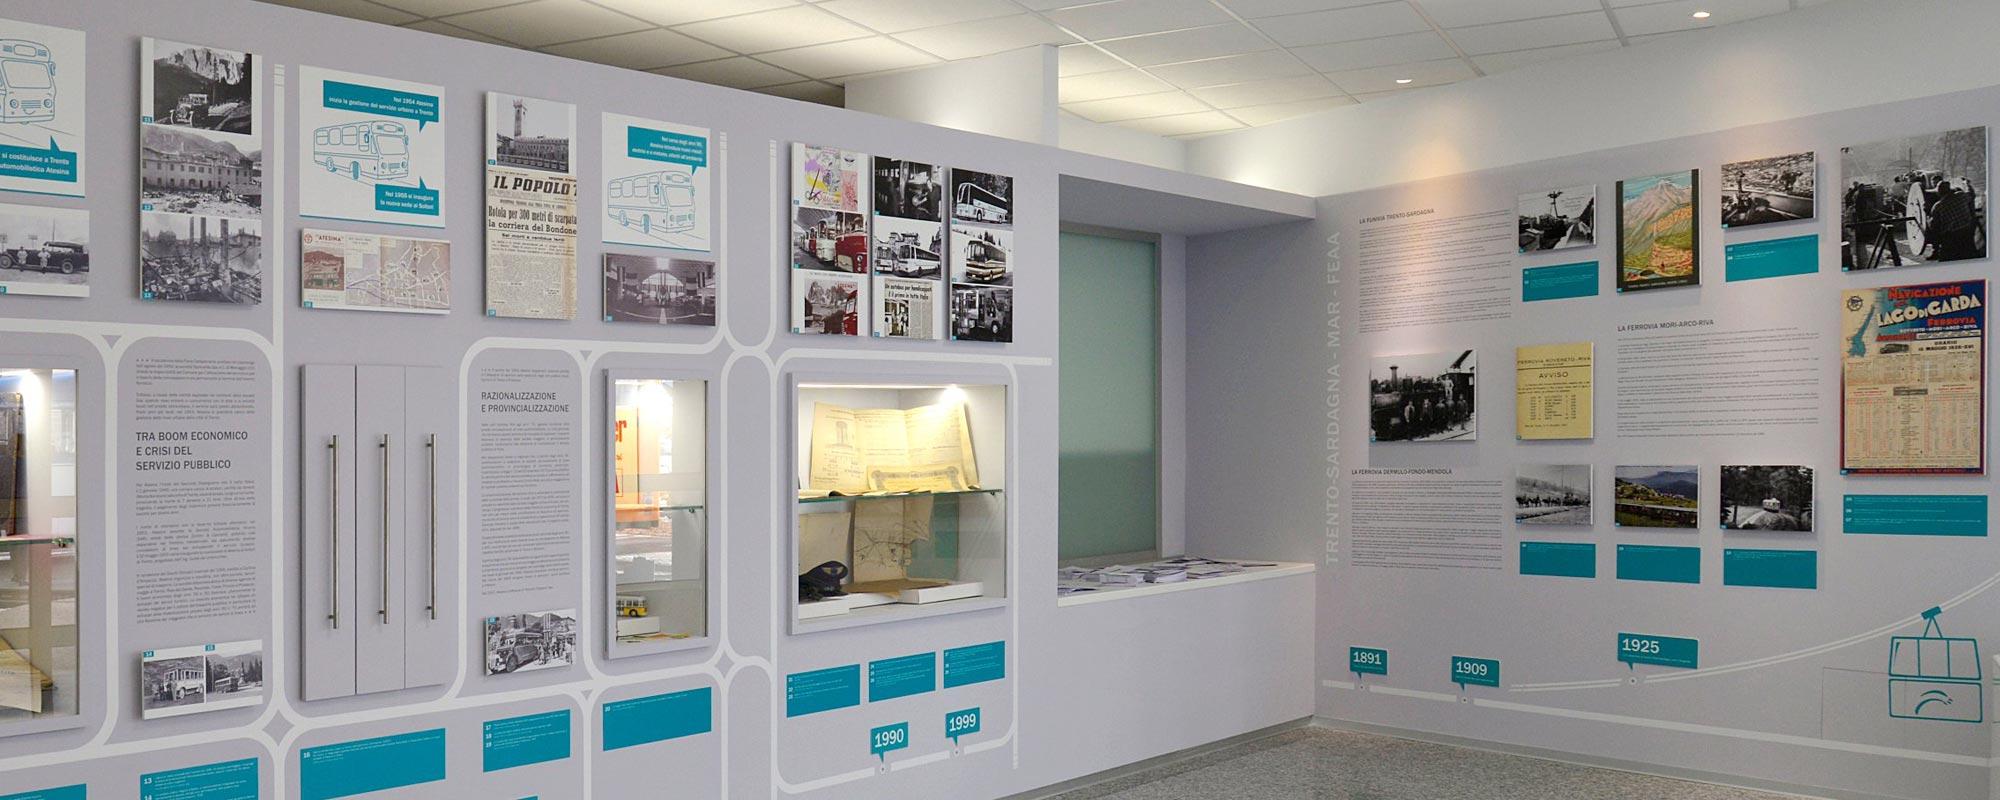 TtrAm Archivio museo